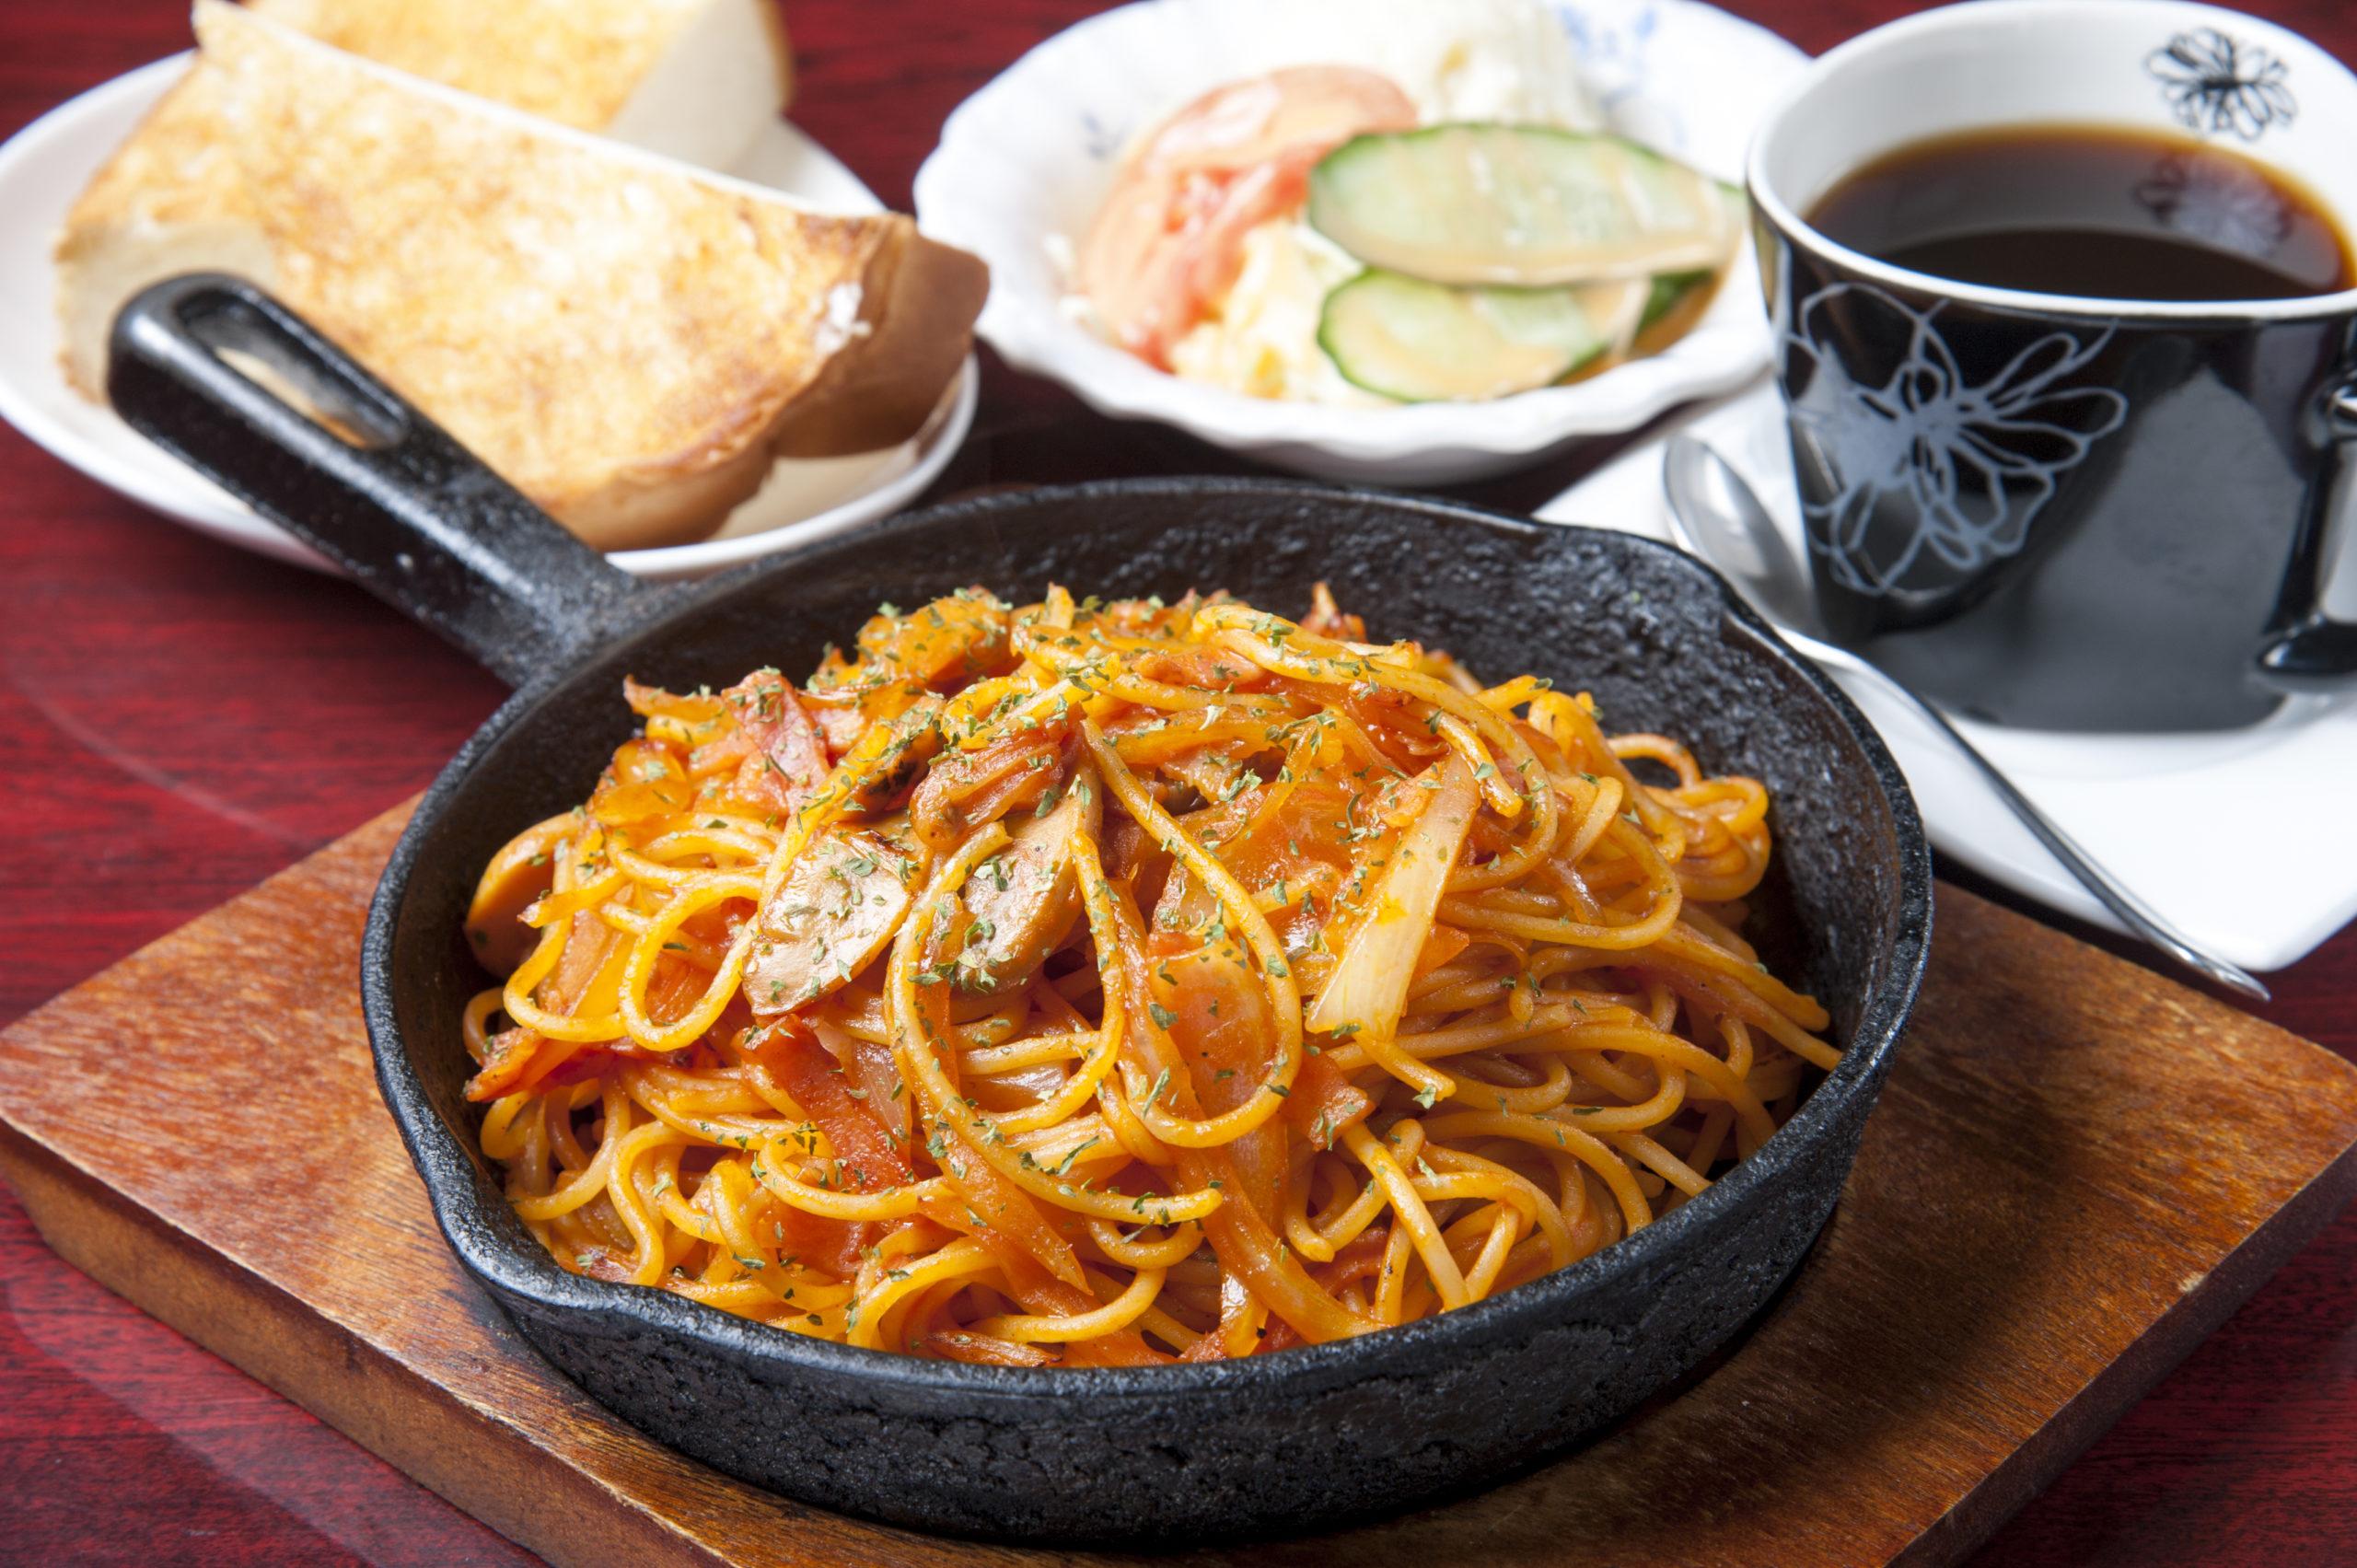 Japanese food, Napolitan spaghetti served warm at kissaten restaurant